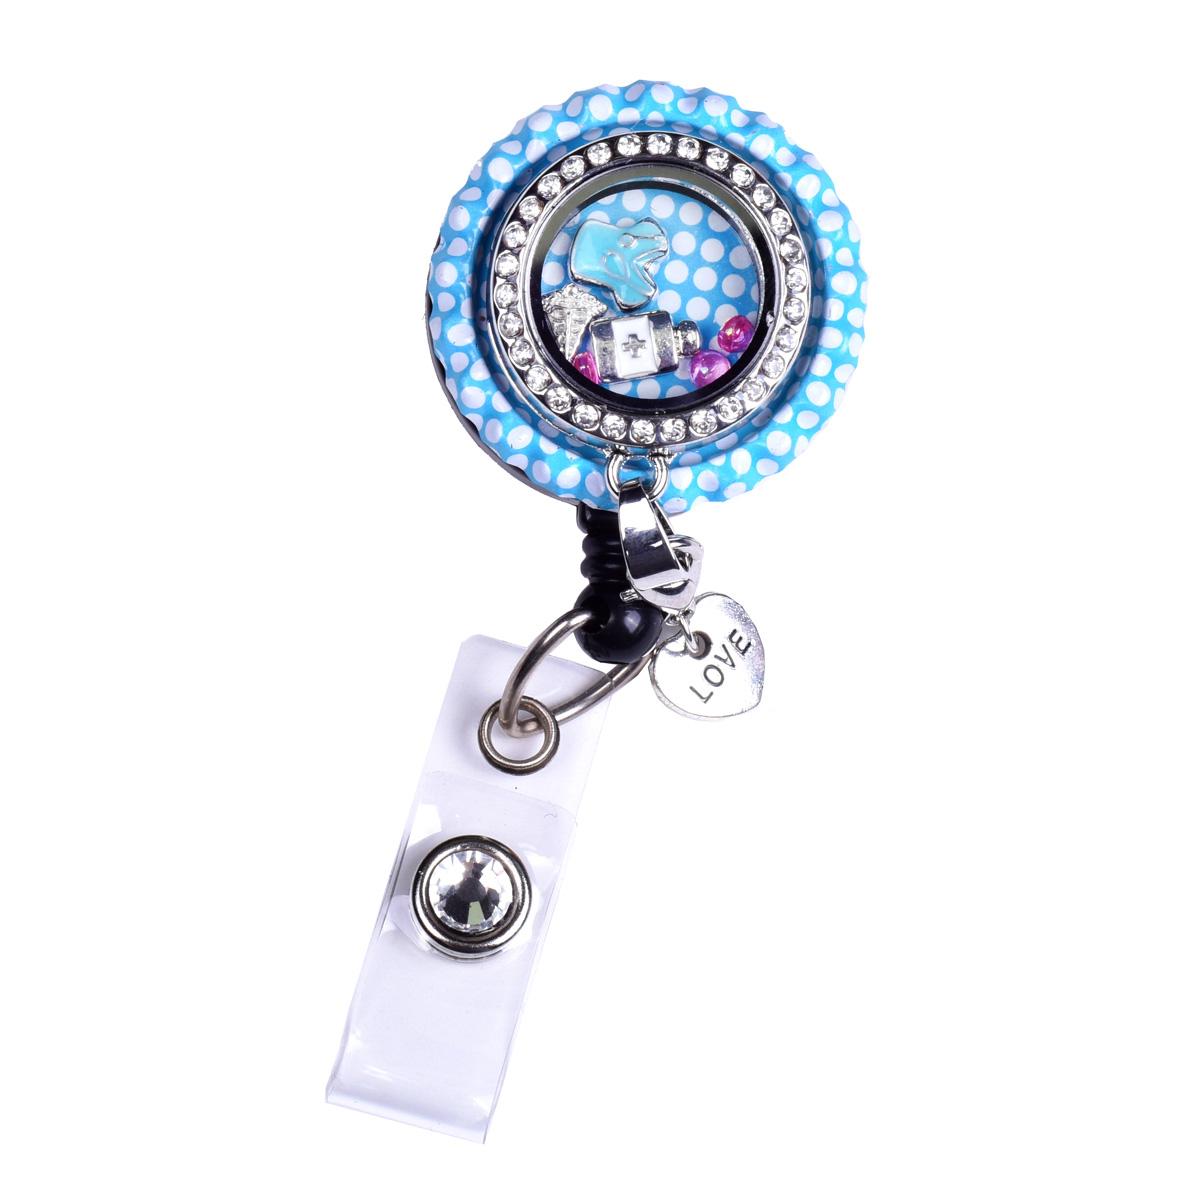 Blue Bottle Cap Nurse Charm Locket Id Badge Holder